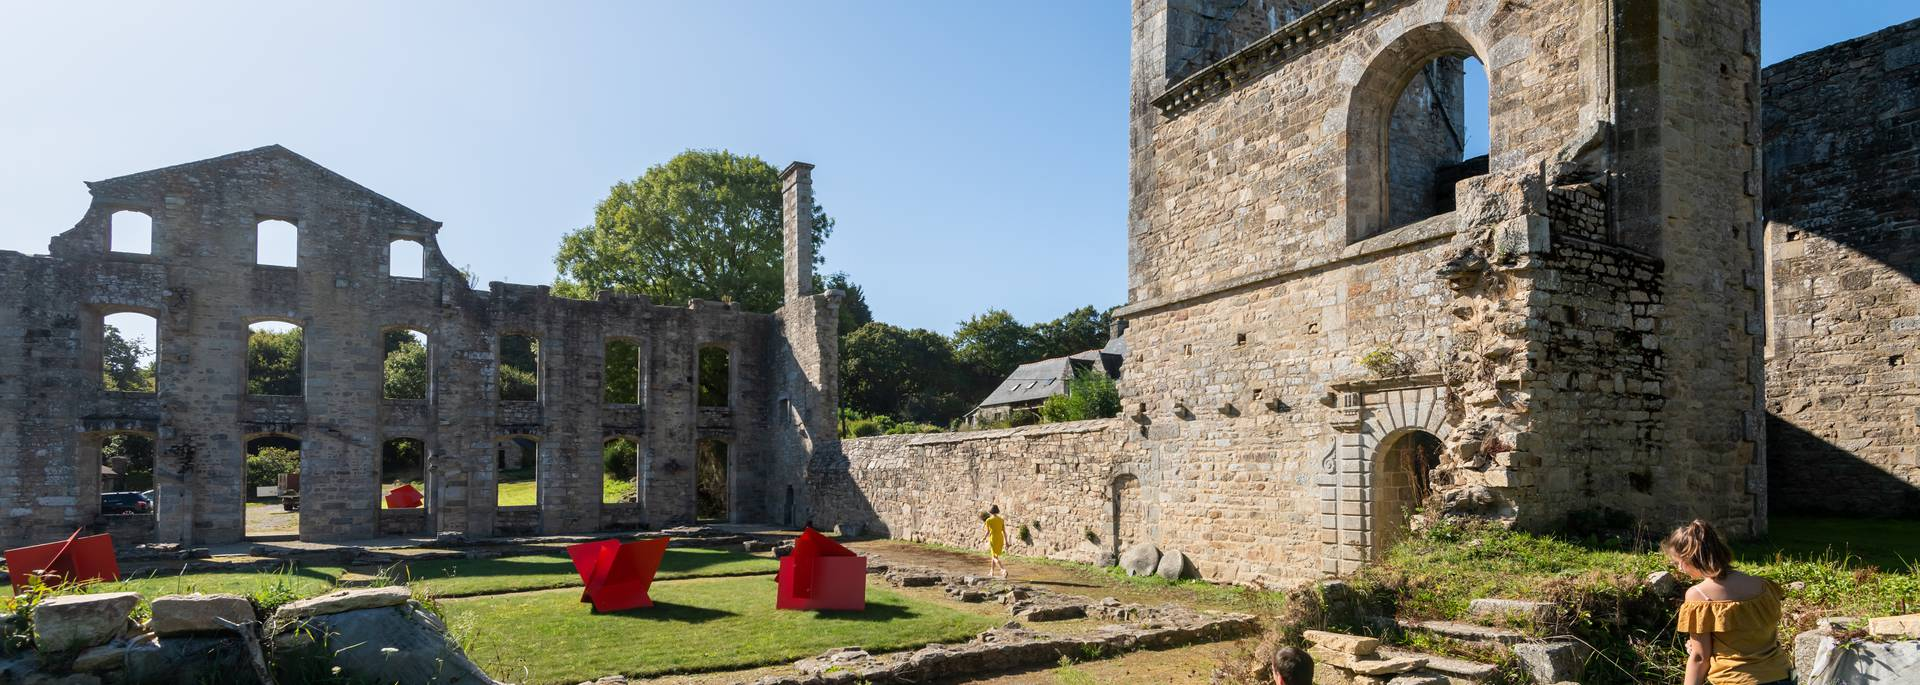 Abbaye de Coat Mallouen @Emmanuel Berthier